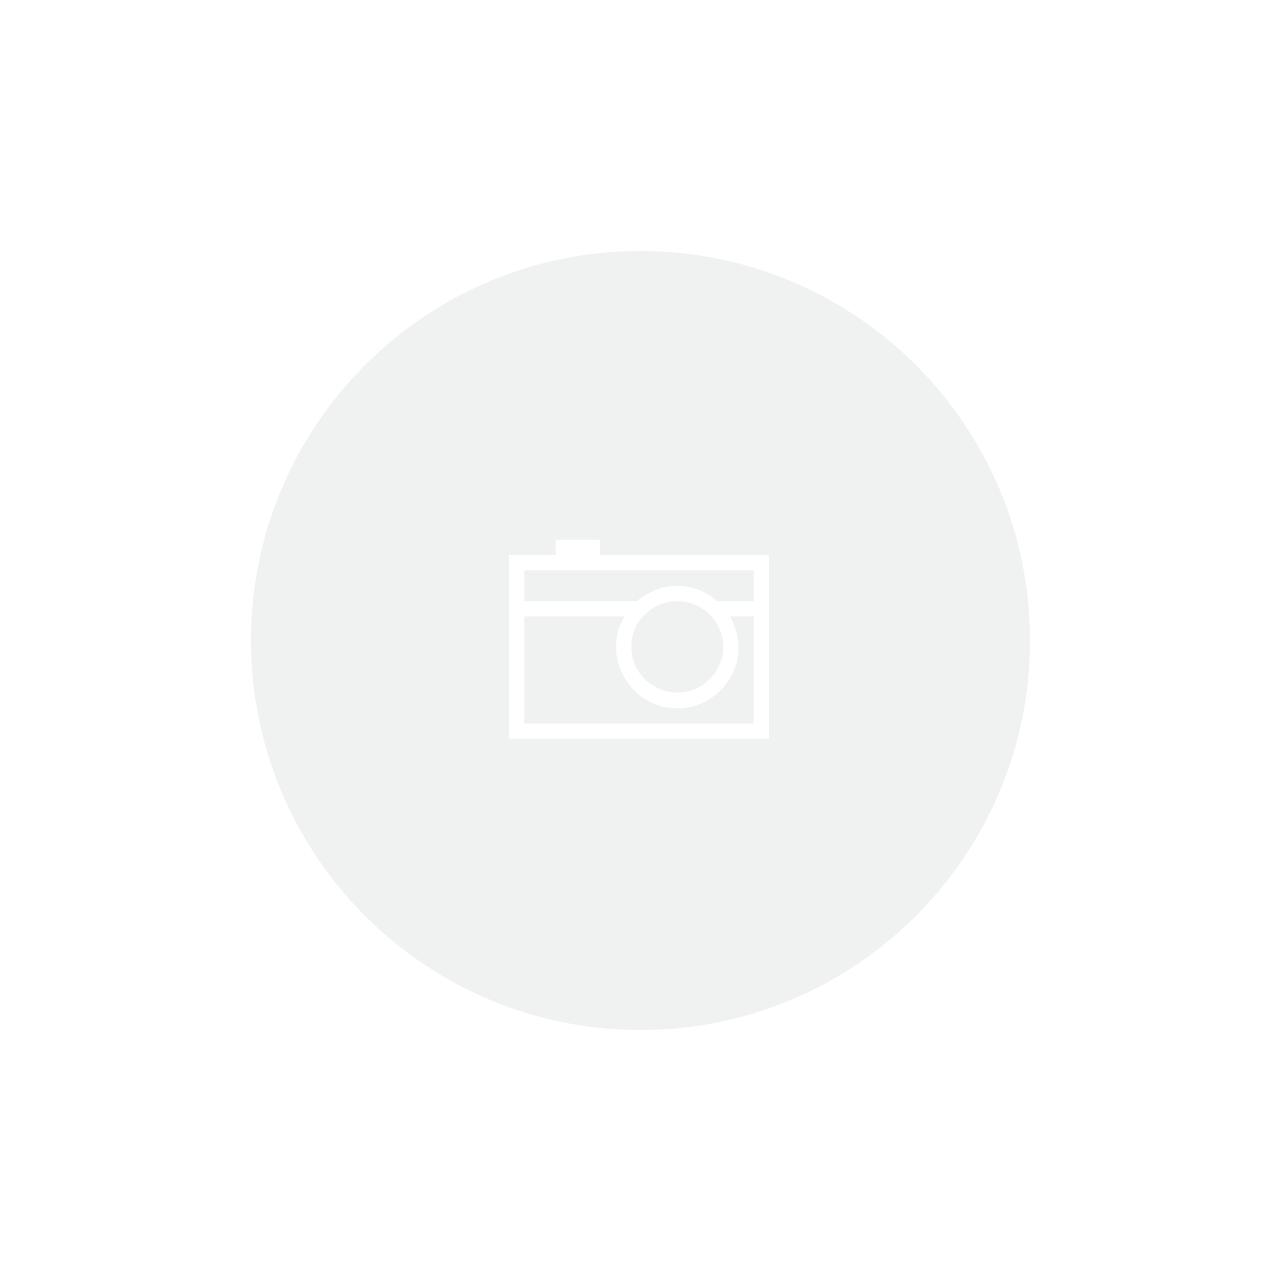 CADEIRINHA THULE FRONT. YEPP MINI (12020102)